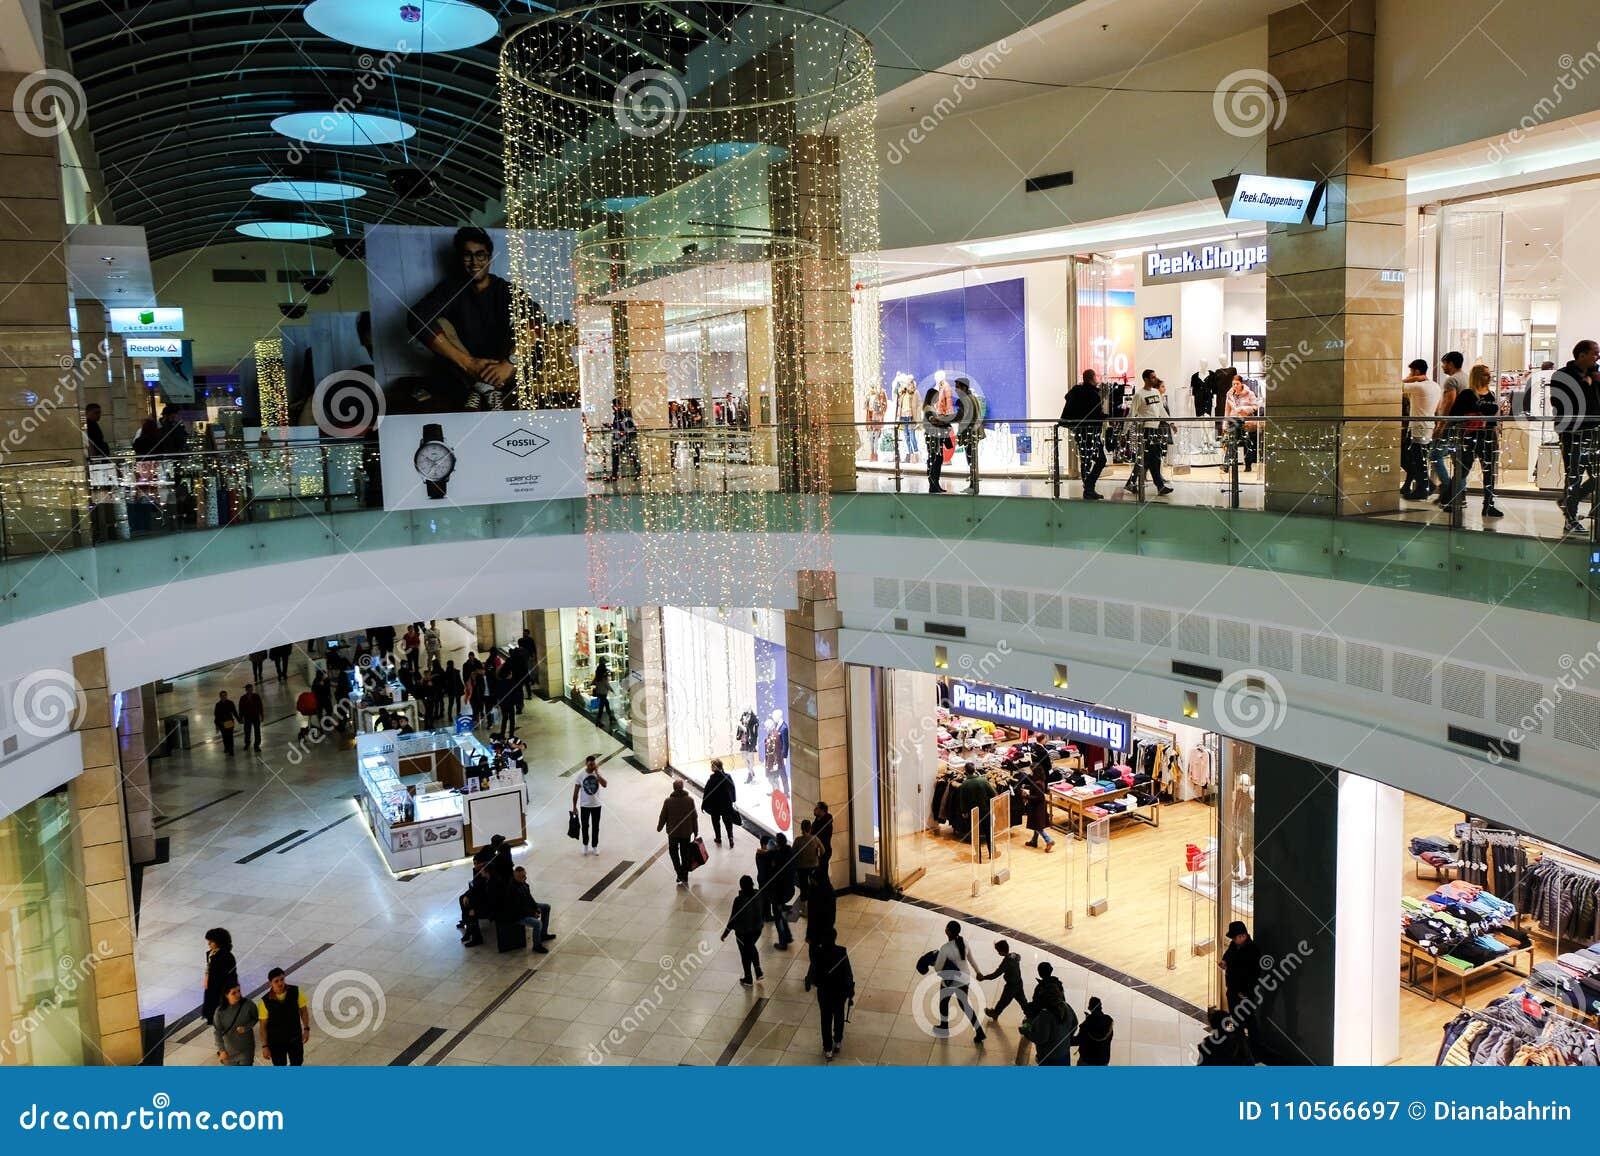 38cfbdca028a Peek Cloppenburg Store In AFI Cotroceni Shopping Mall, Bucharest ...